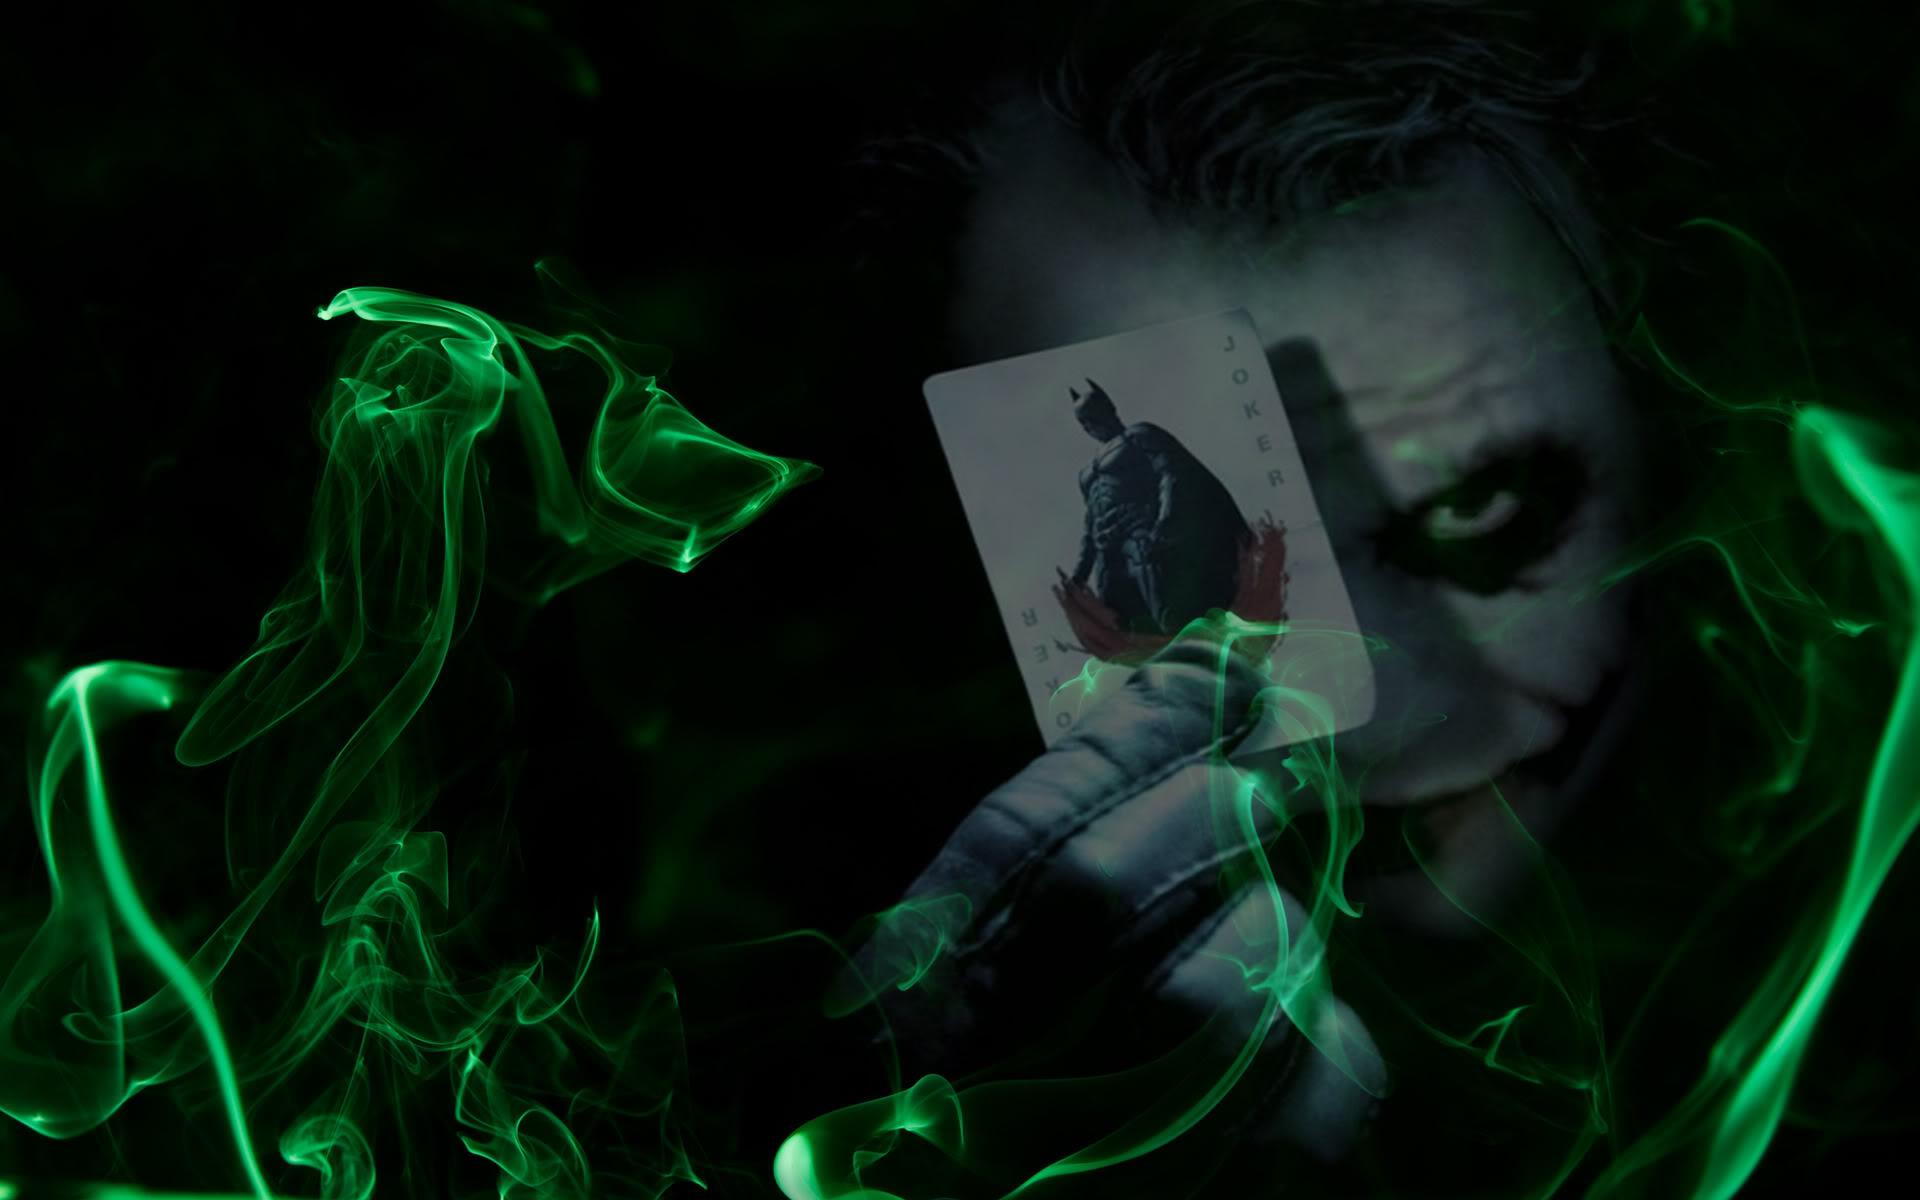 43 Joker 3d Wallpaper On Wallpapersafari